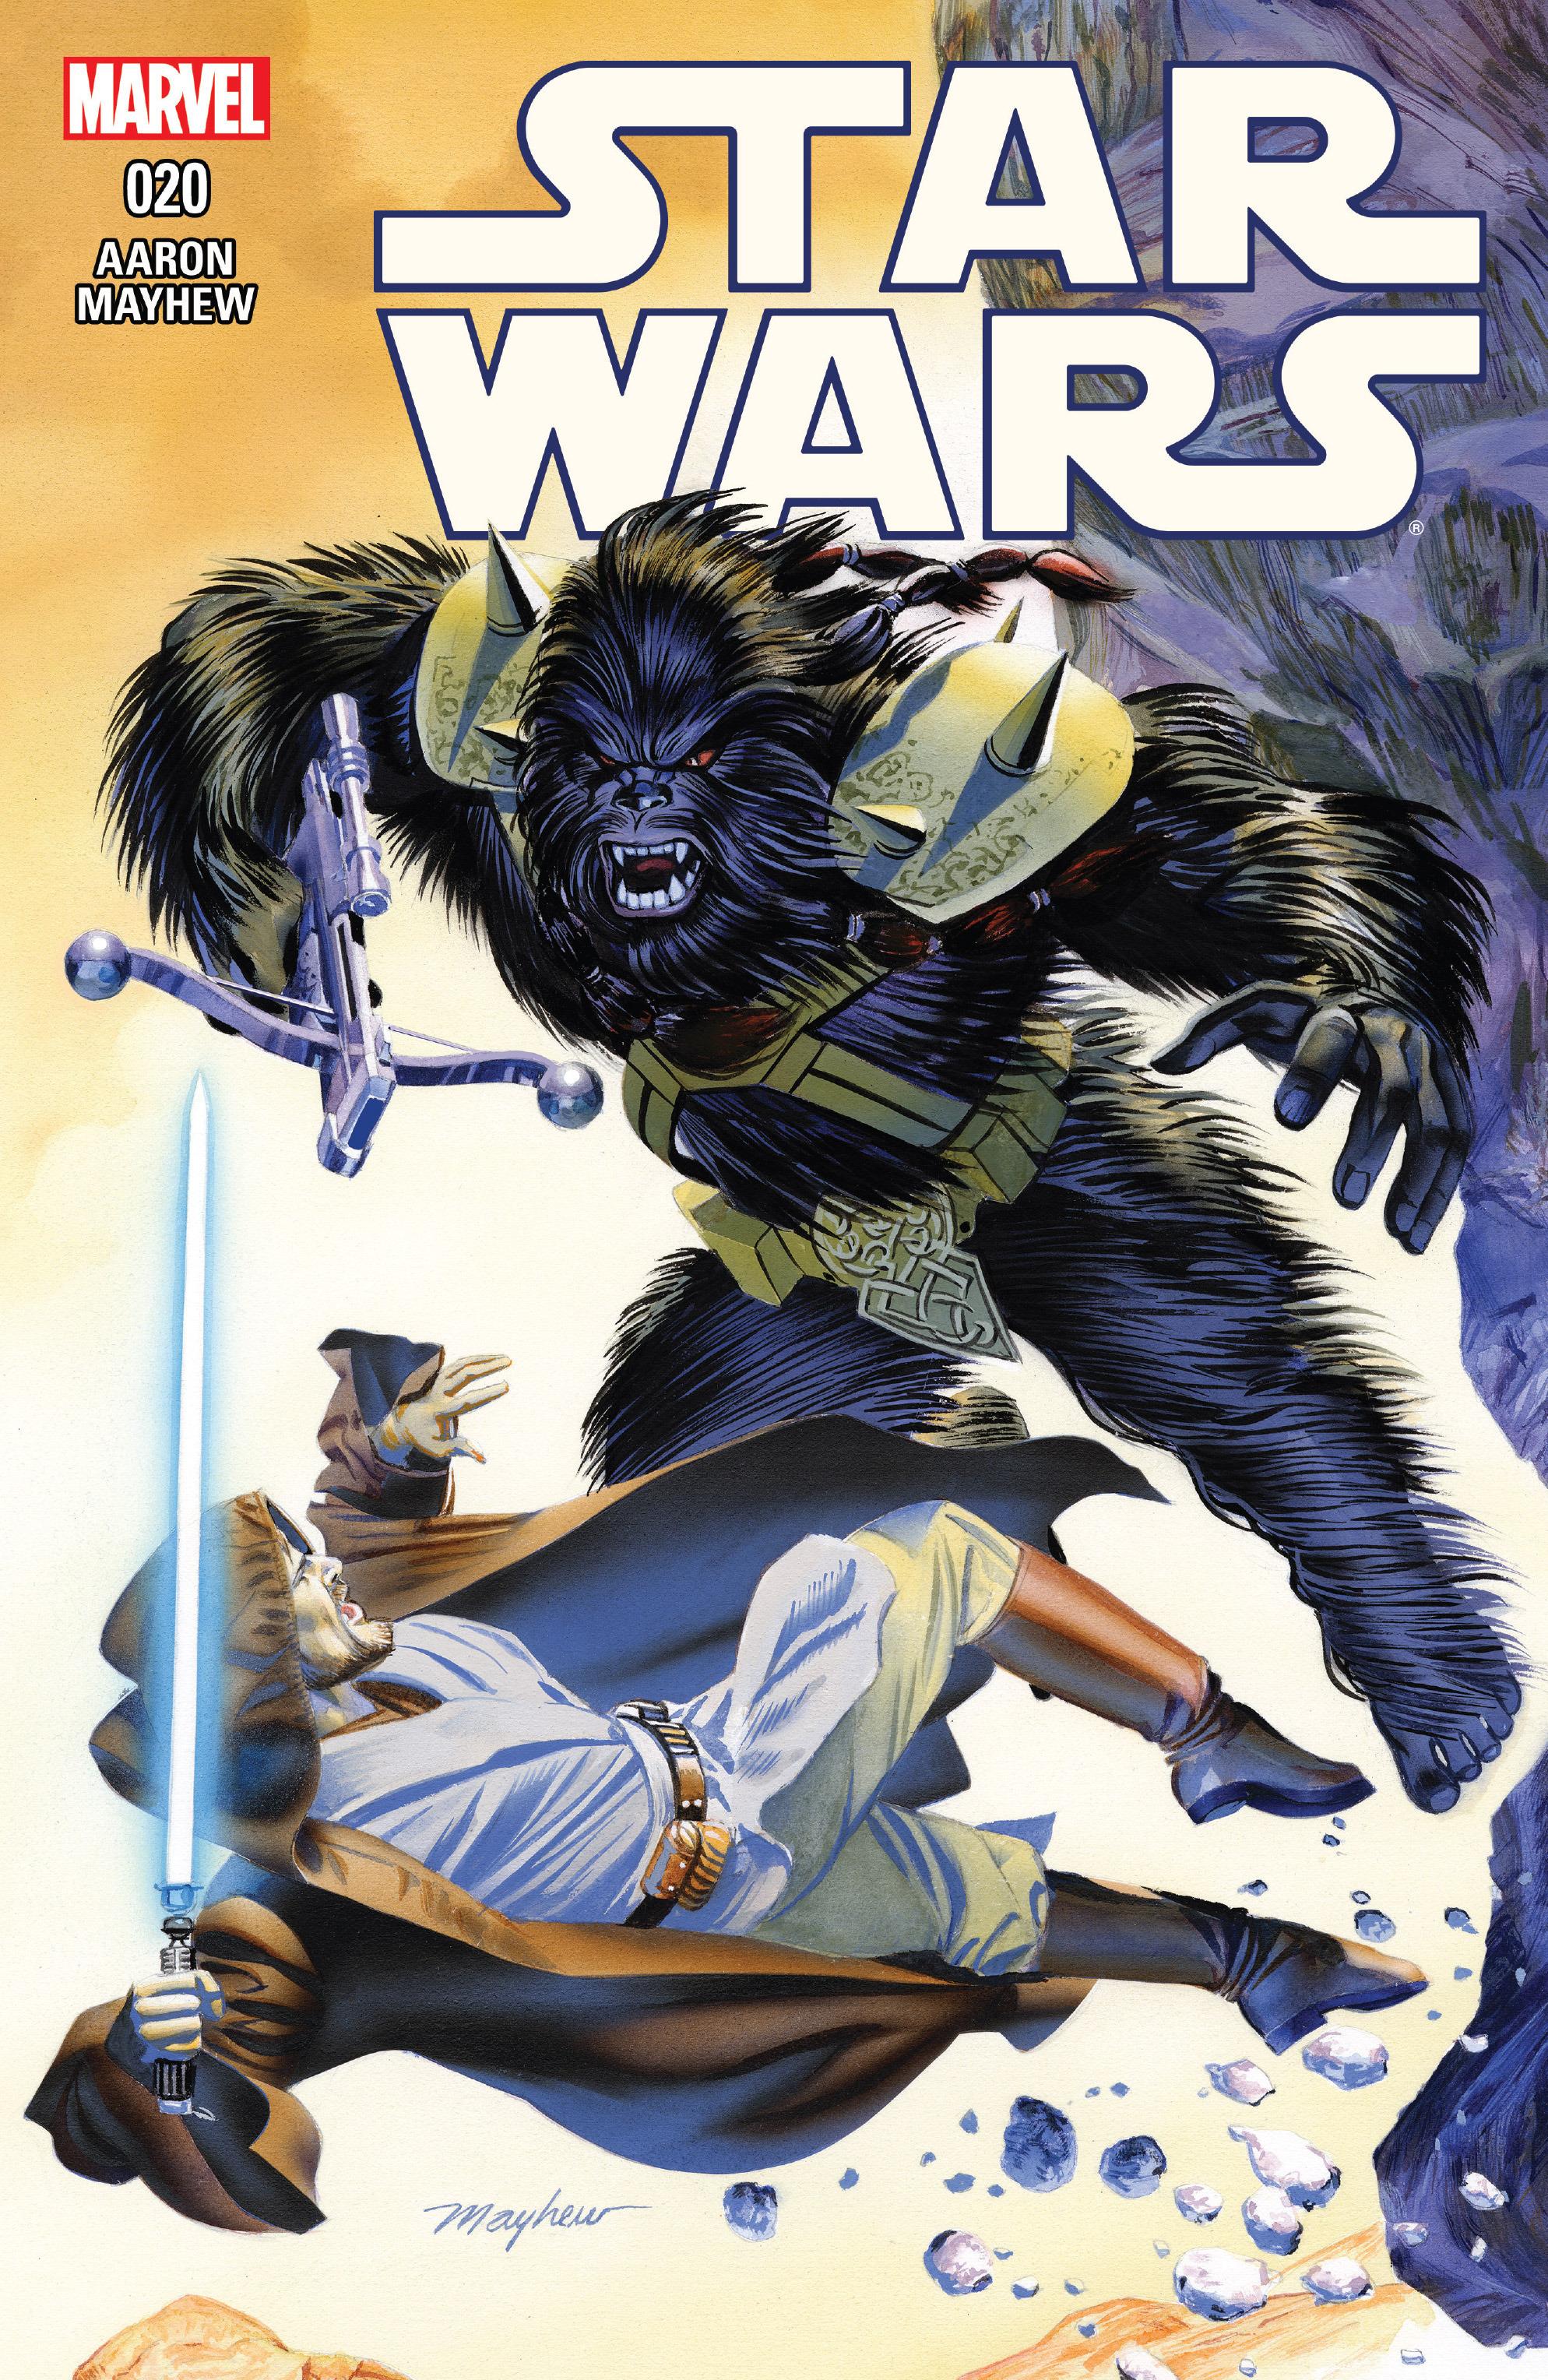 Star-Wars-020-000a